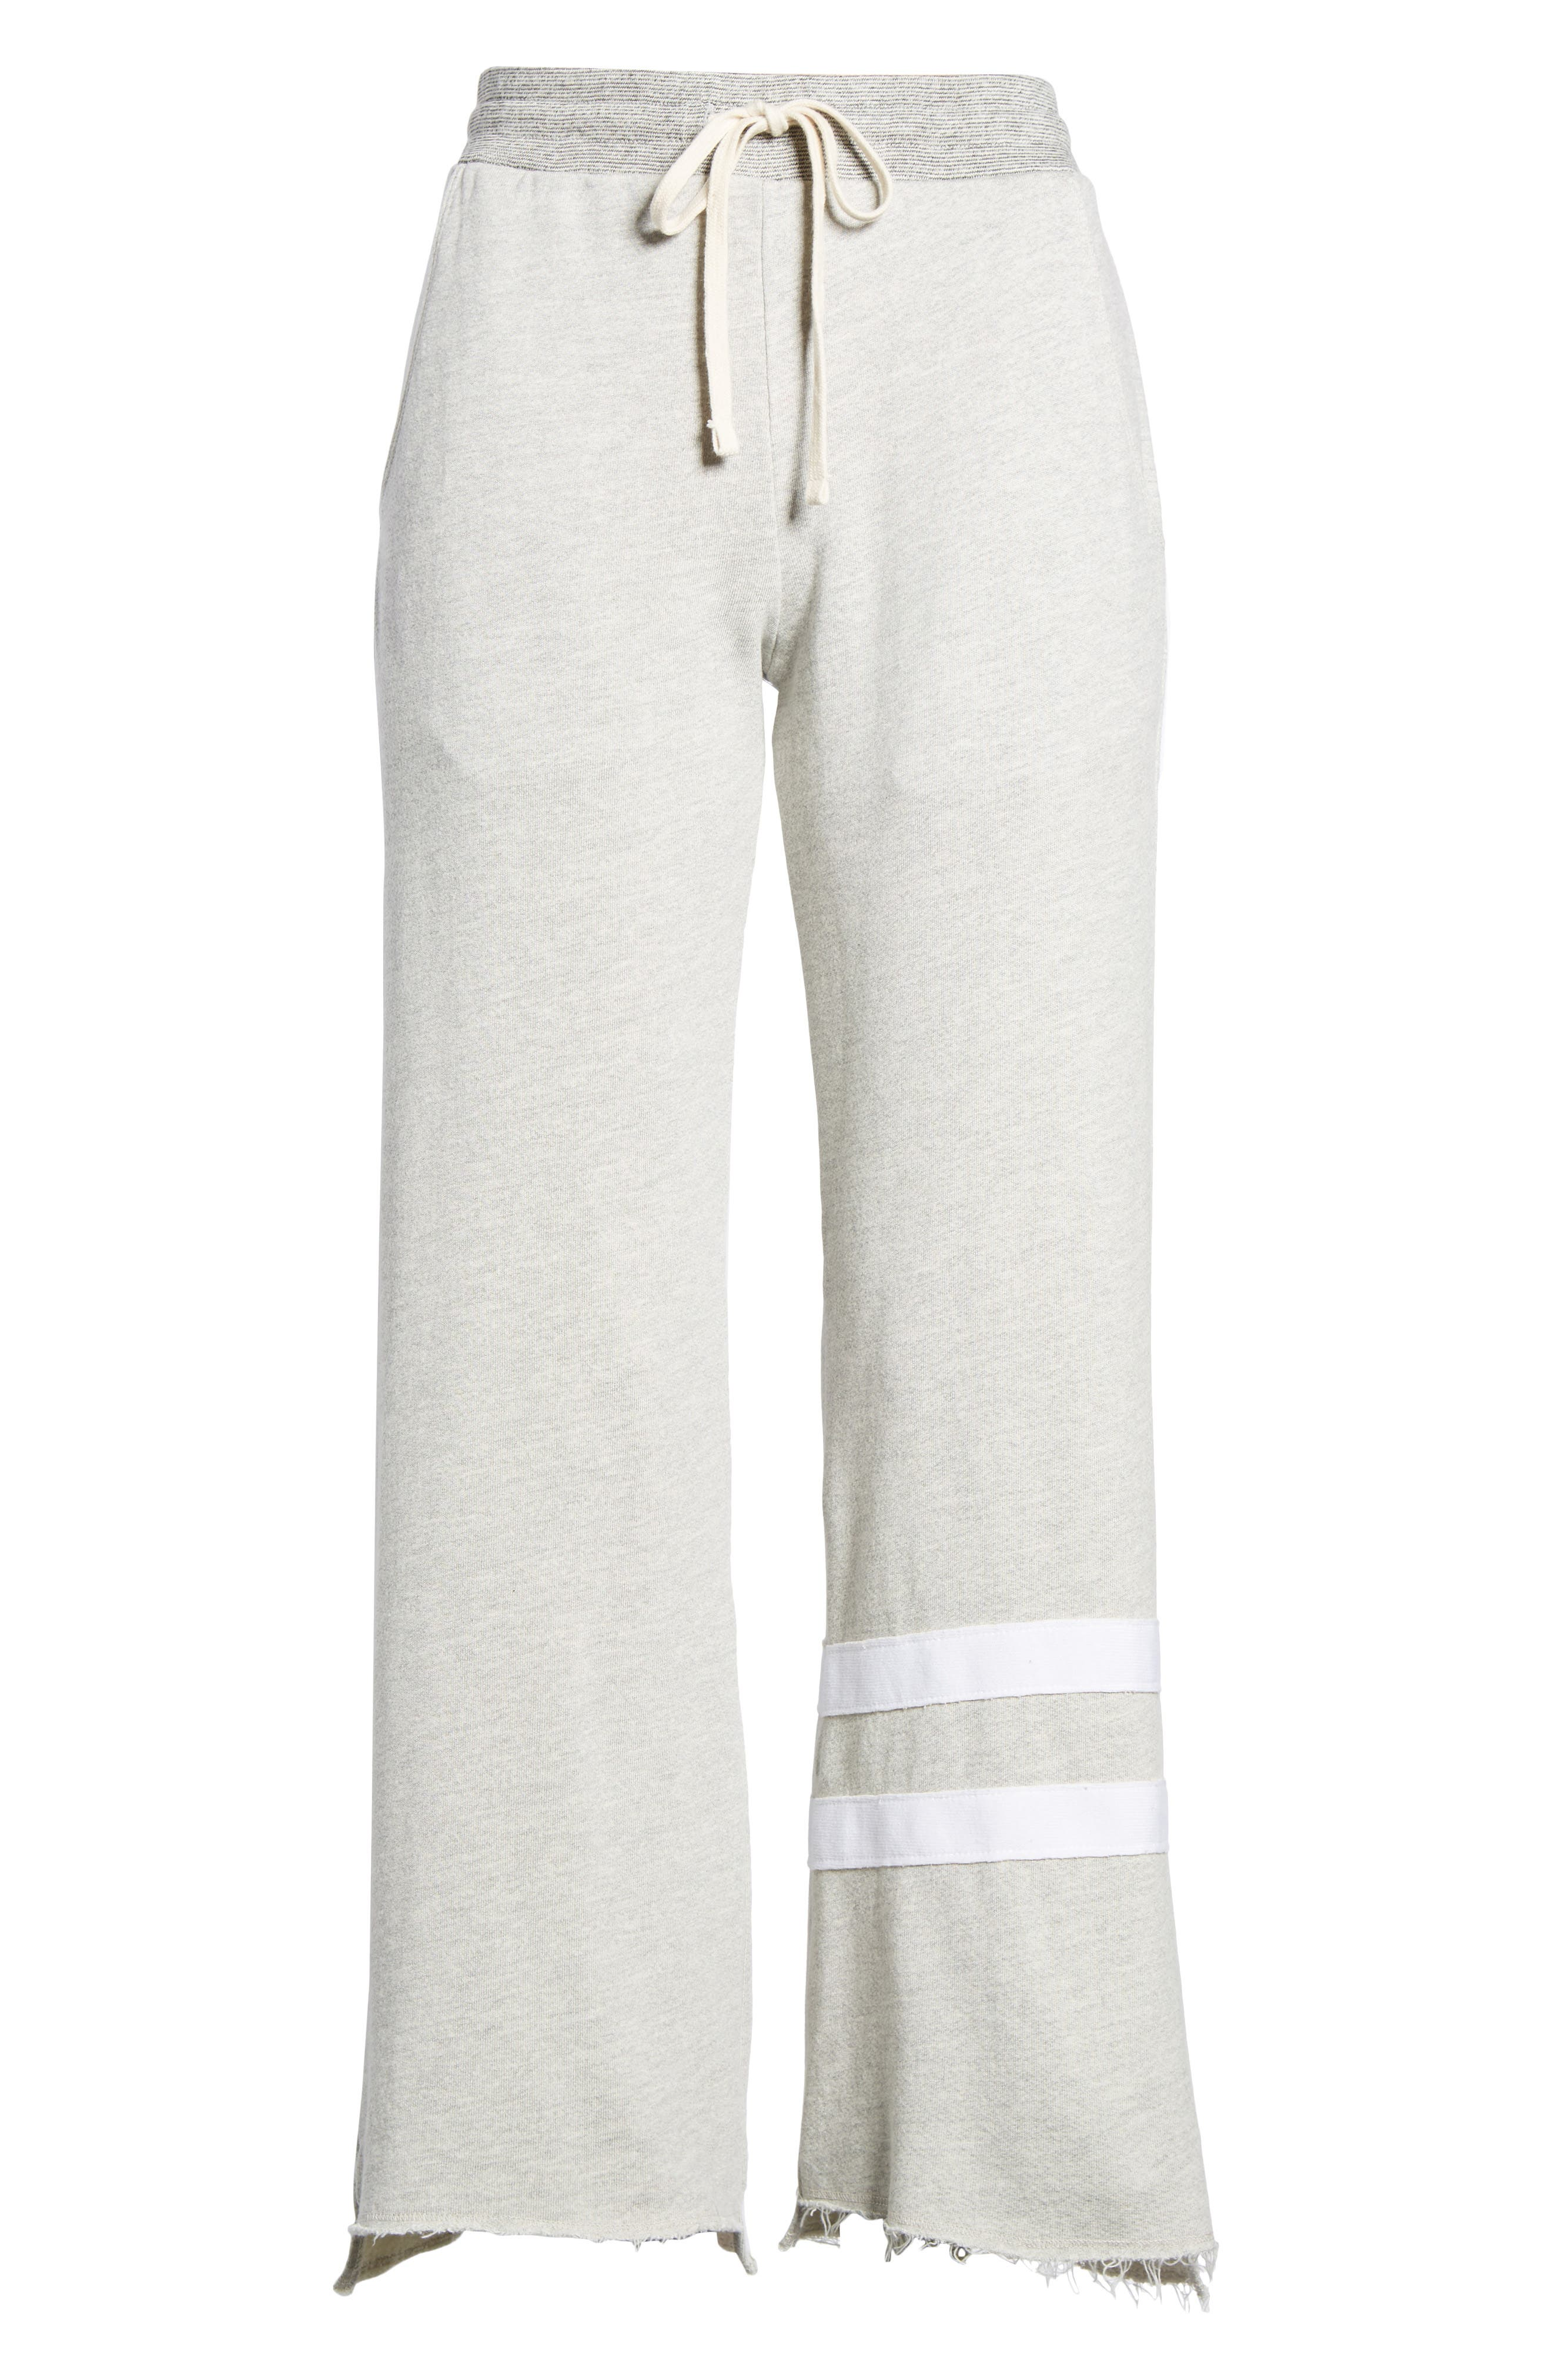 Stripe Flare Sweatpants,                             Alternate thumbnail 6, color,                             039